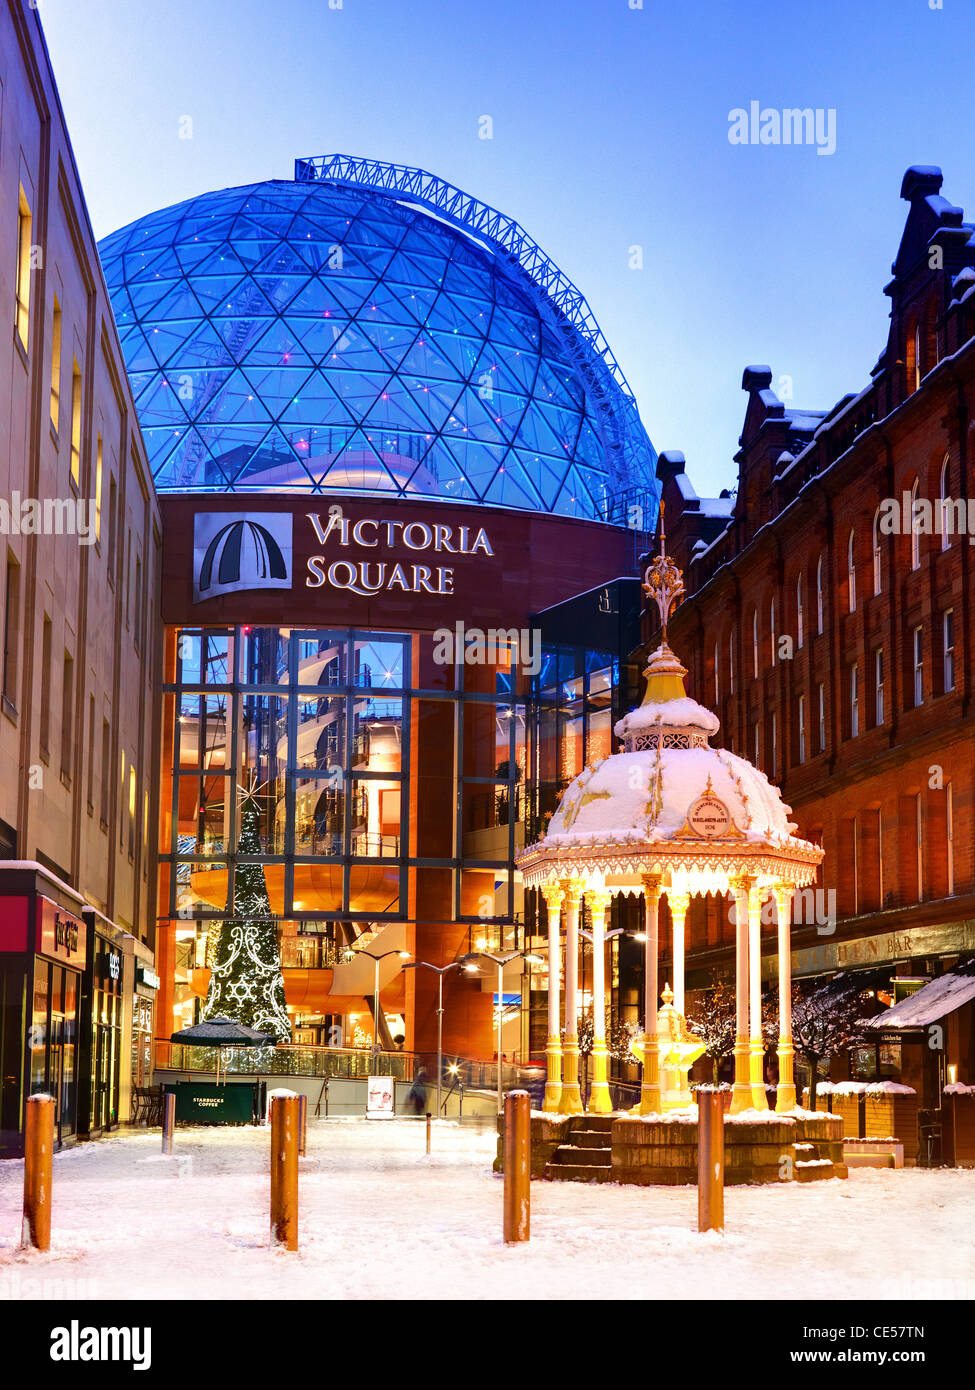 Victoria Square in the Snow, Belfast, Northern Ireland - Stock Image